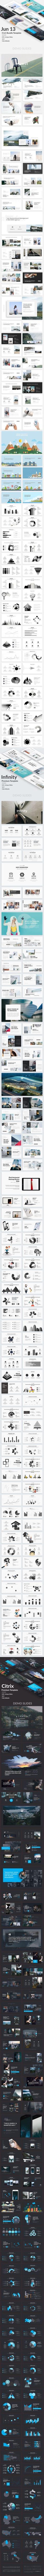 3 in 1 Premium Bundle - Jun 13 Powerpoint Template - Creative PowerPoint Templates #powerpoint